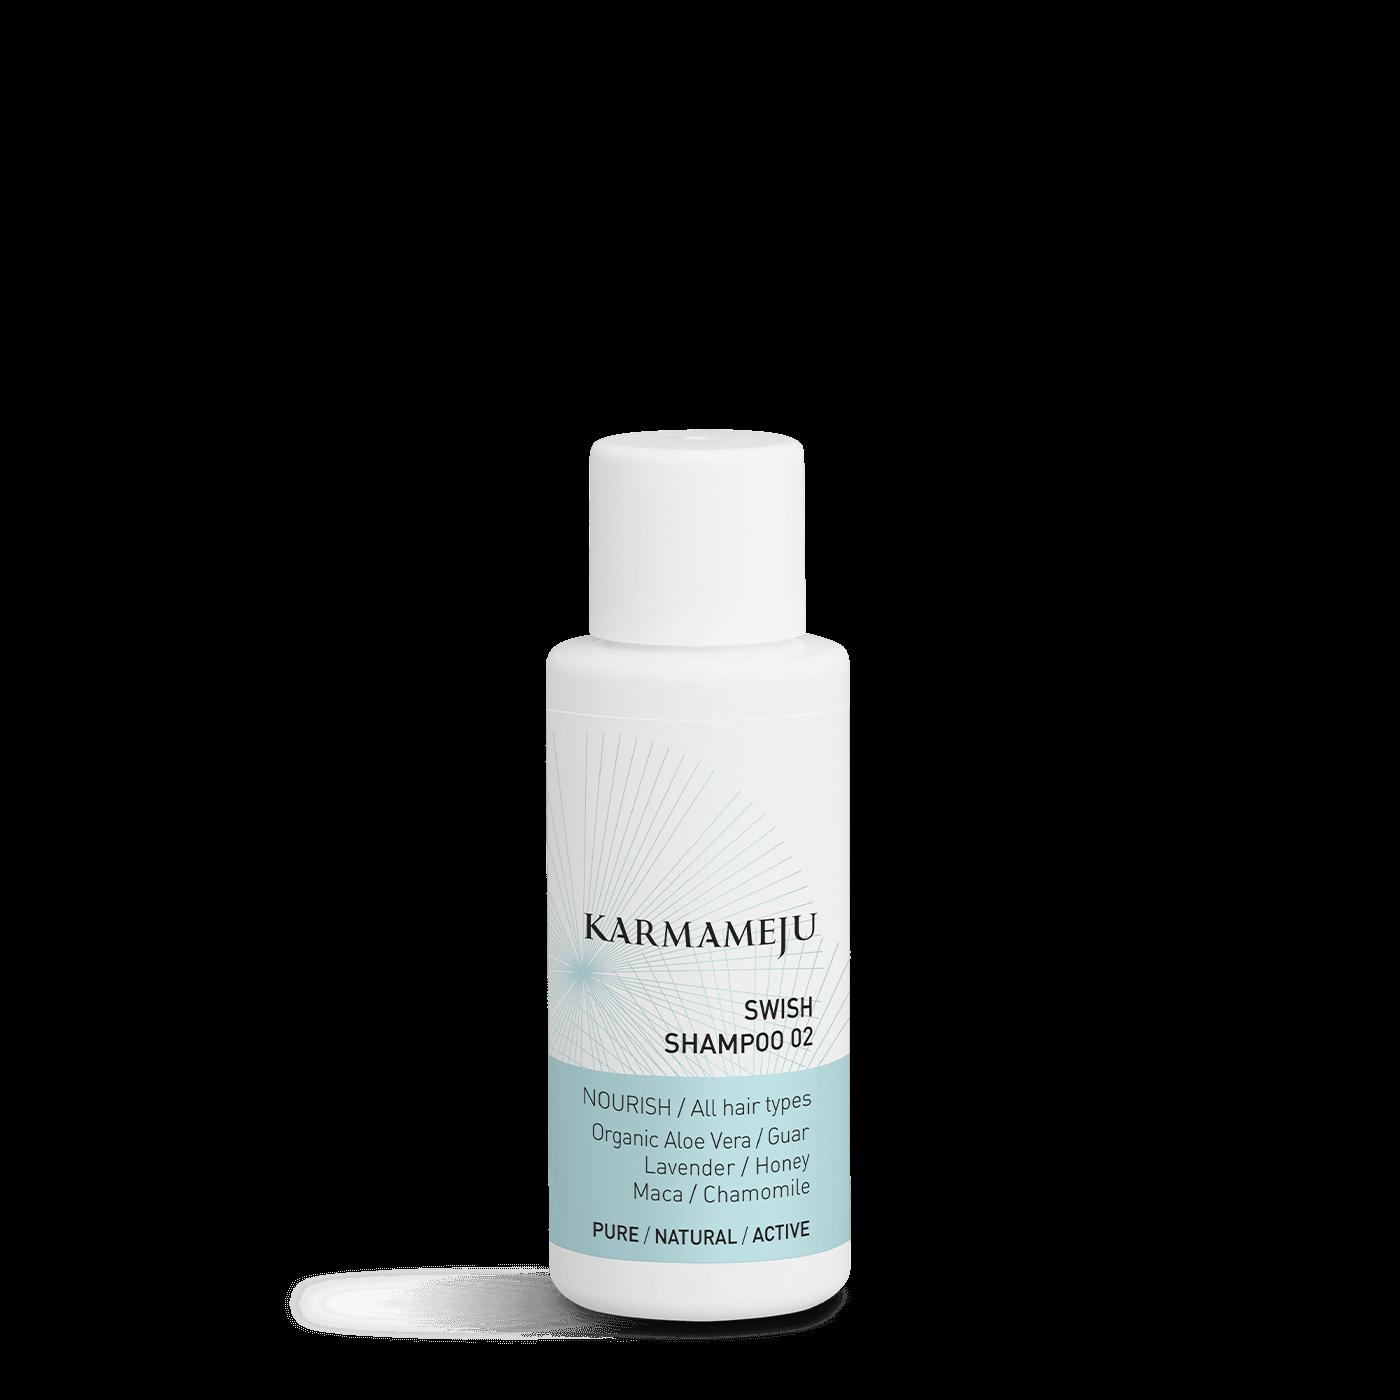 Karmameju SWISH / SHAMPOO 02 - Travel size